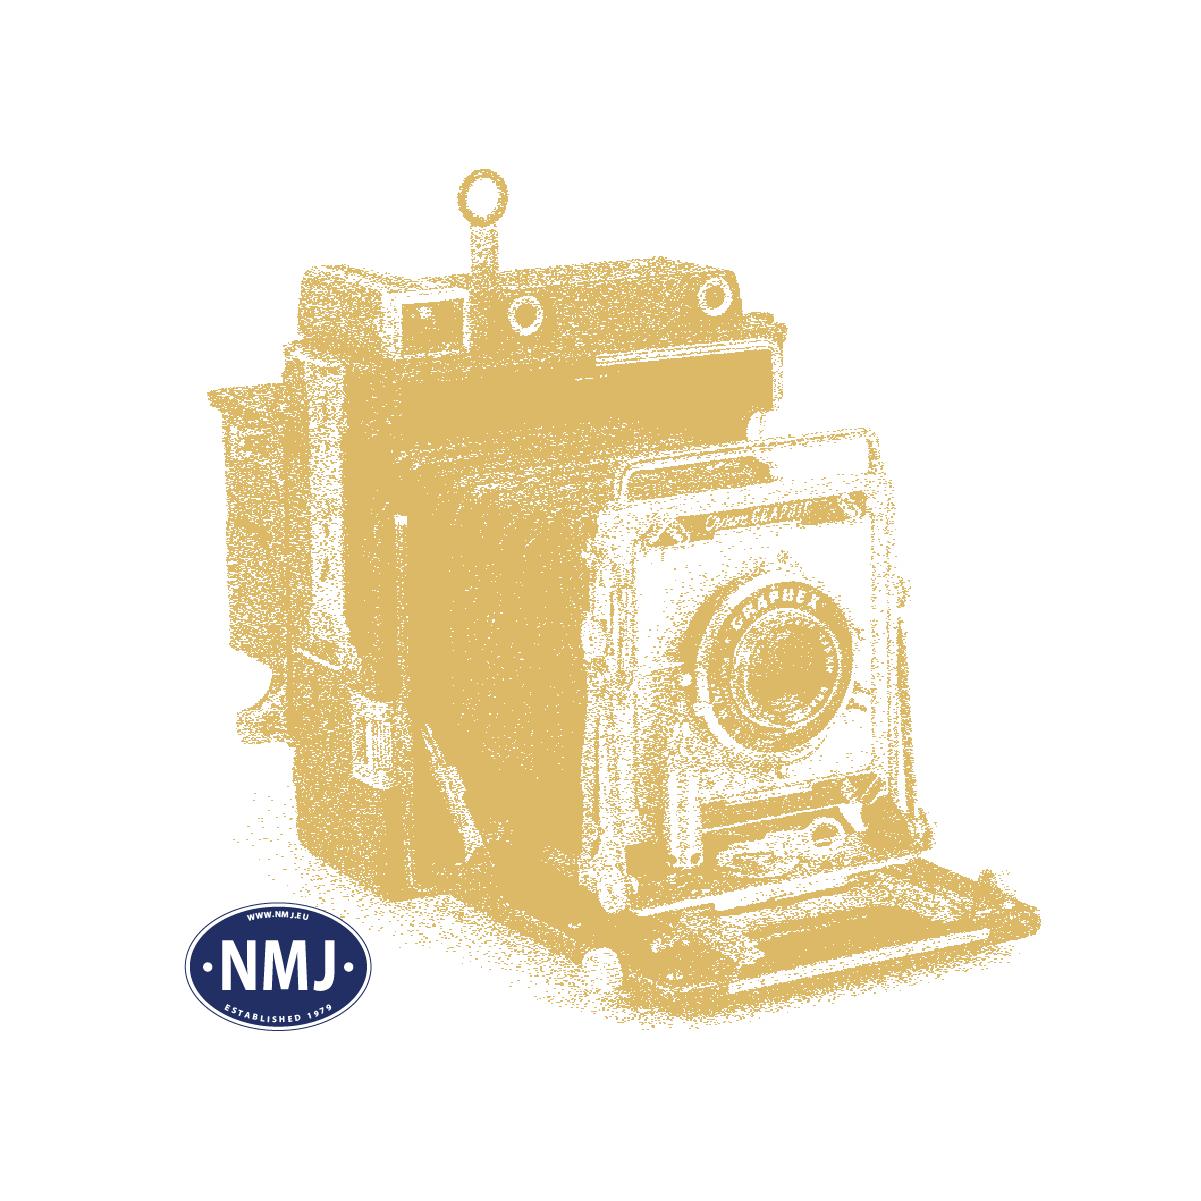 NMJT90012 - NMJ Topline NSB Di3a 619, Gammeldesign, DCC m/ Lyd